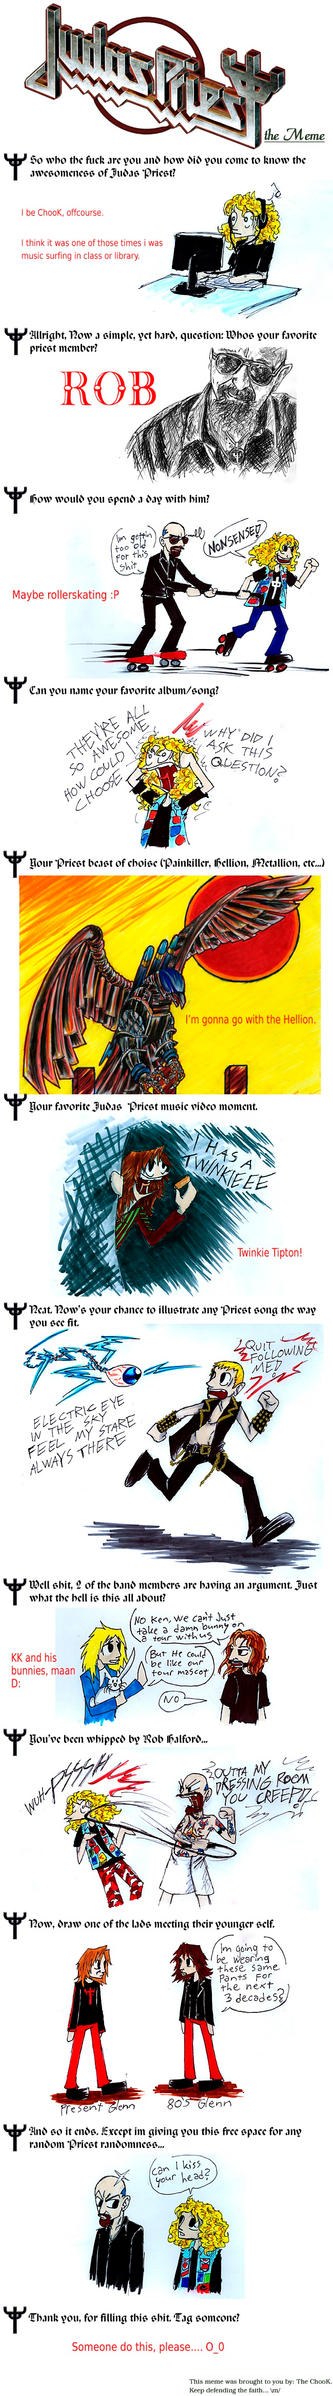 Judas Priest meme. by the-ChooK